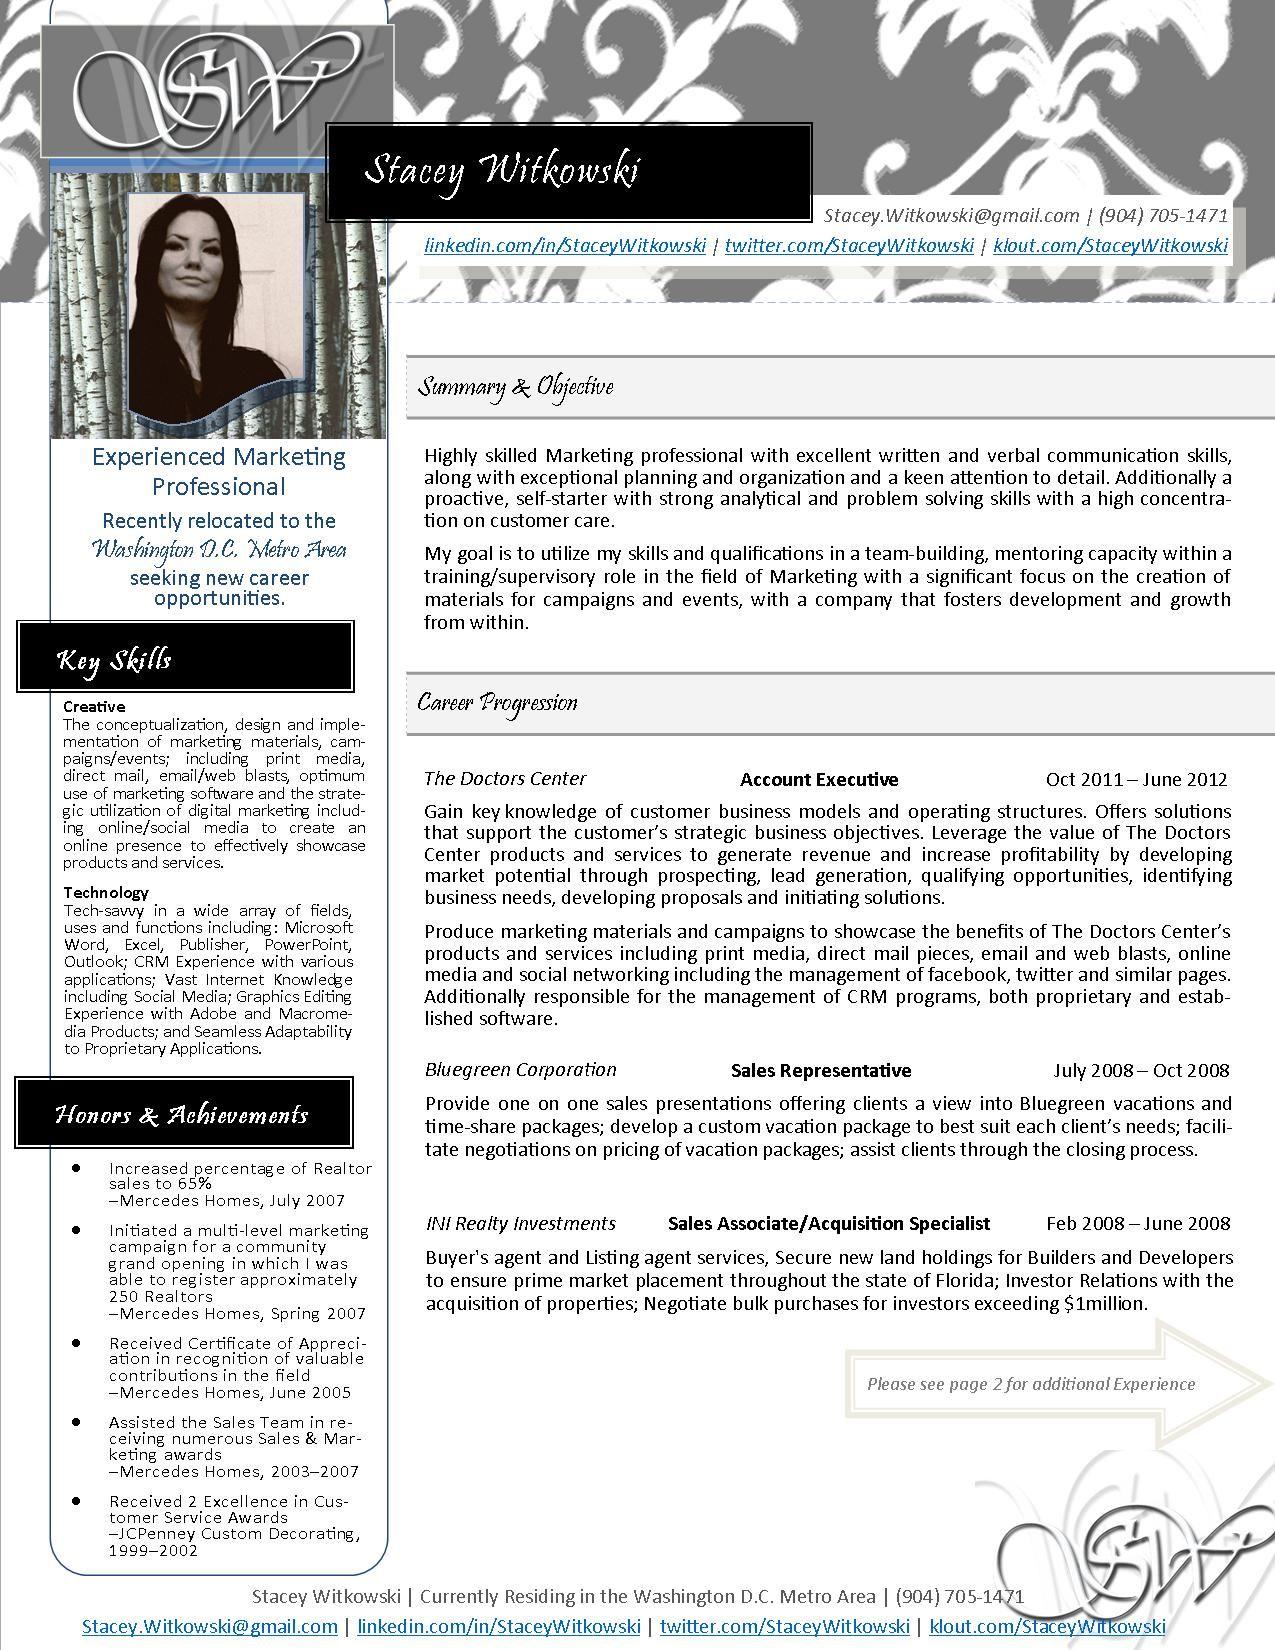 New Resume Design (PG1) Stacey Witkowski 2013 MyResume